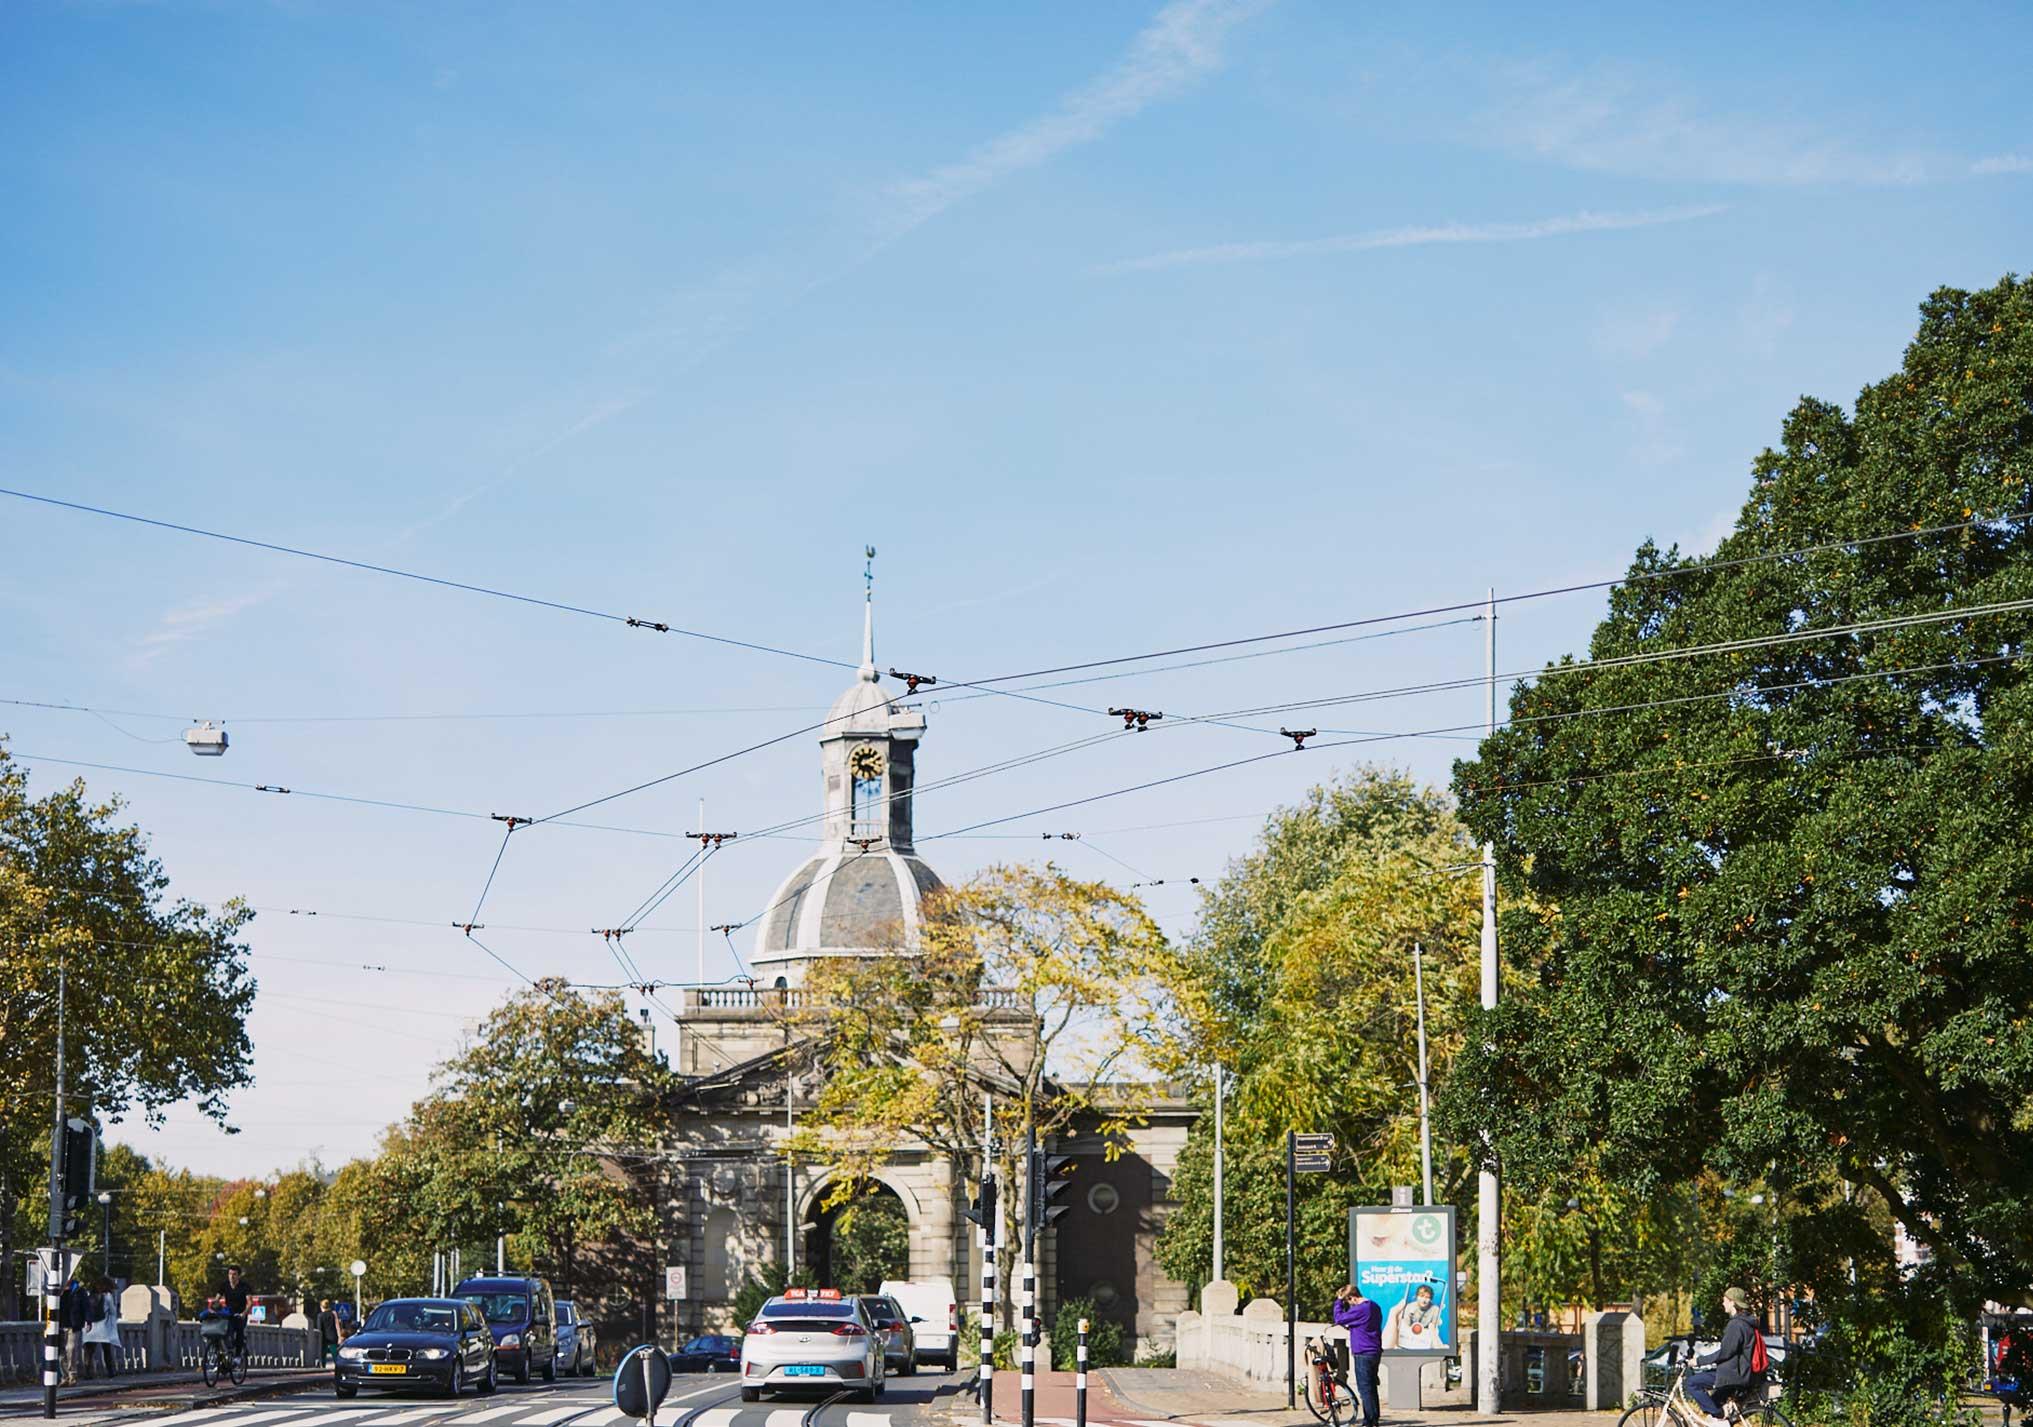 hubstudios Oosterpark